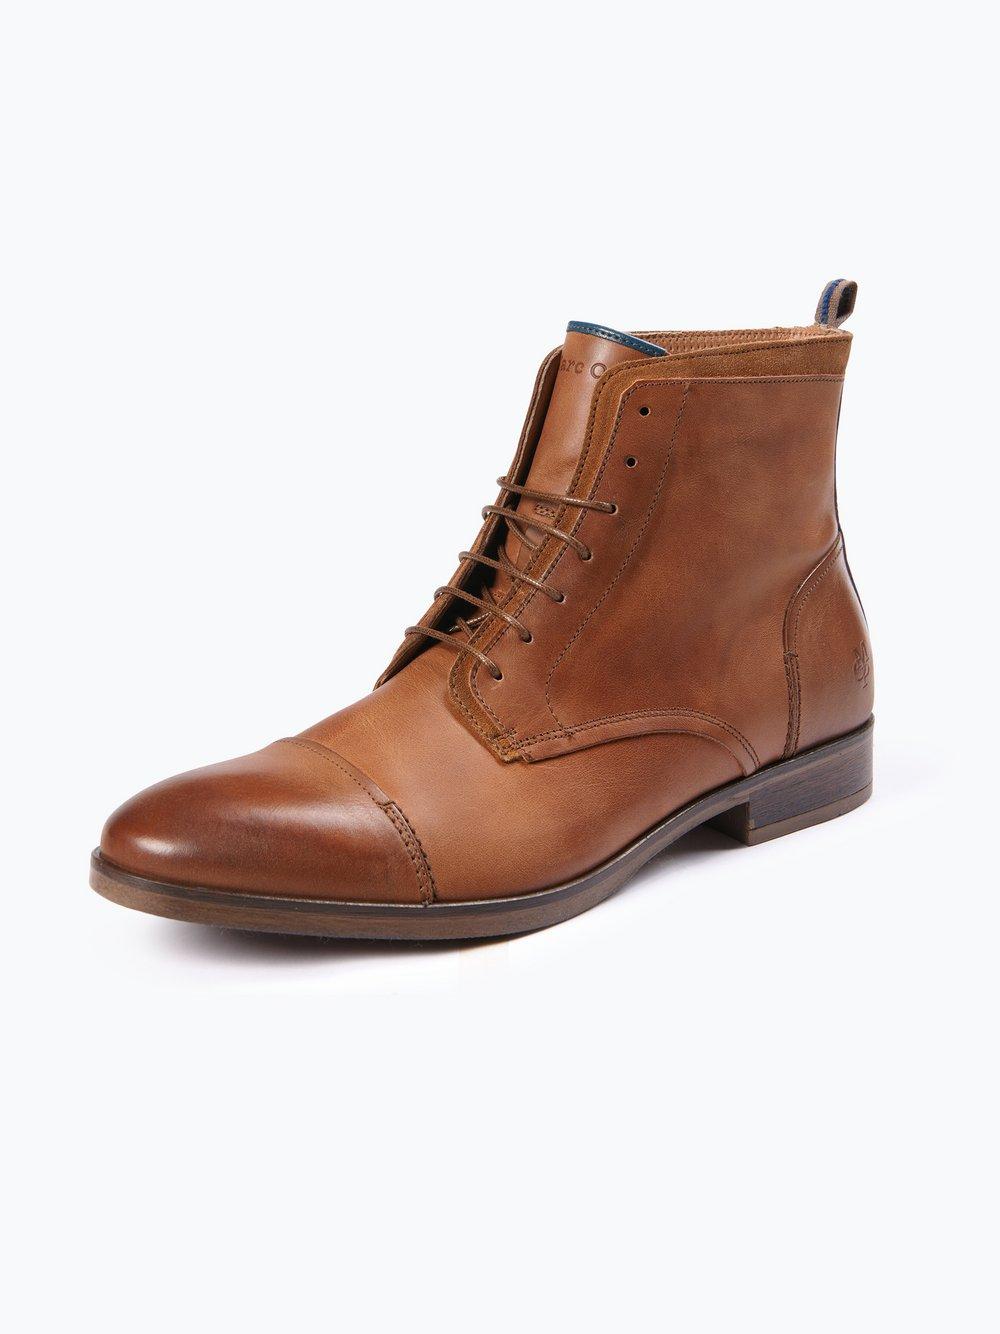 Marc O Polo Herren Boots aus Leder online kaufen   VANGRAAF.COM d3dcae3421